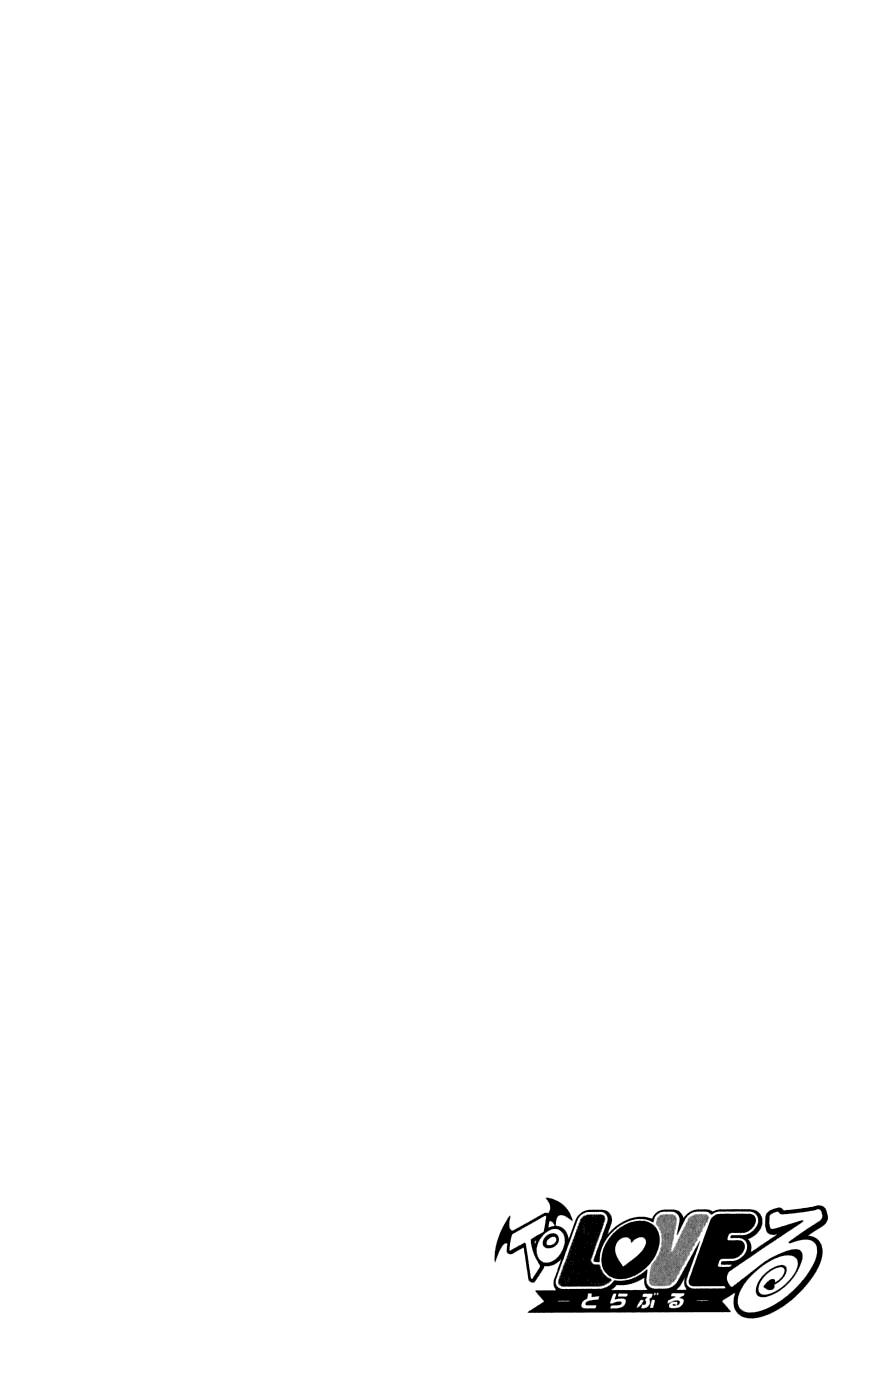 Манга Любовные неприятности / To Love-Ru  - Том 16 Глава 141 Страница 20